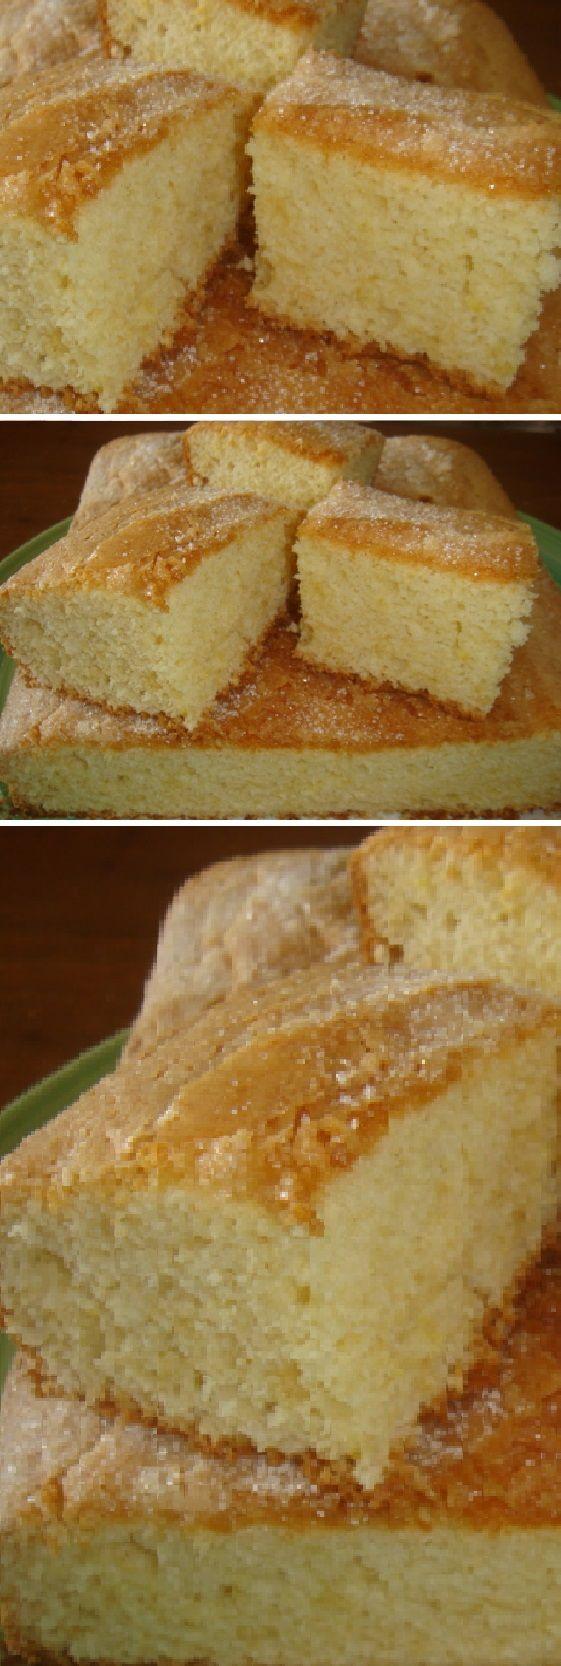 Torta de las 20 cucharadas... #20 #cucharadas  #perfect #postres #receta #recipe #casero #torta #tartas #pastel #nestlecocina #bizcocho #bizcochuelo #tasty #cocina #chocolate #pan #panes  Si te gusta dinos HOLA y dale a Me Gusta MIREN …